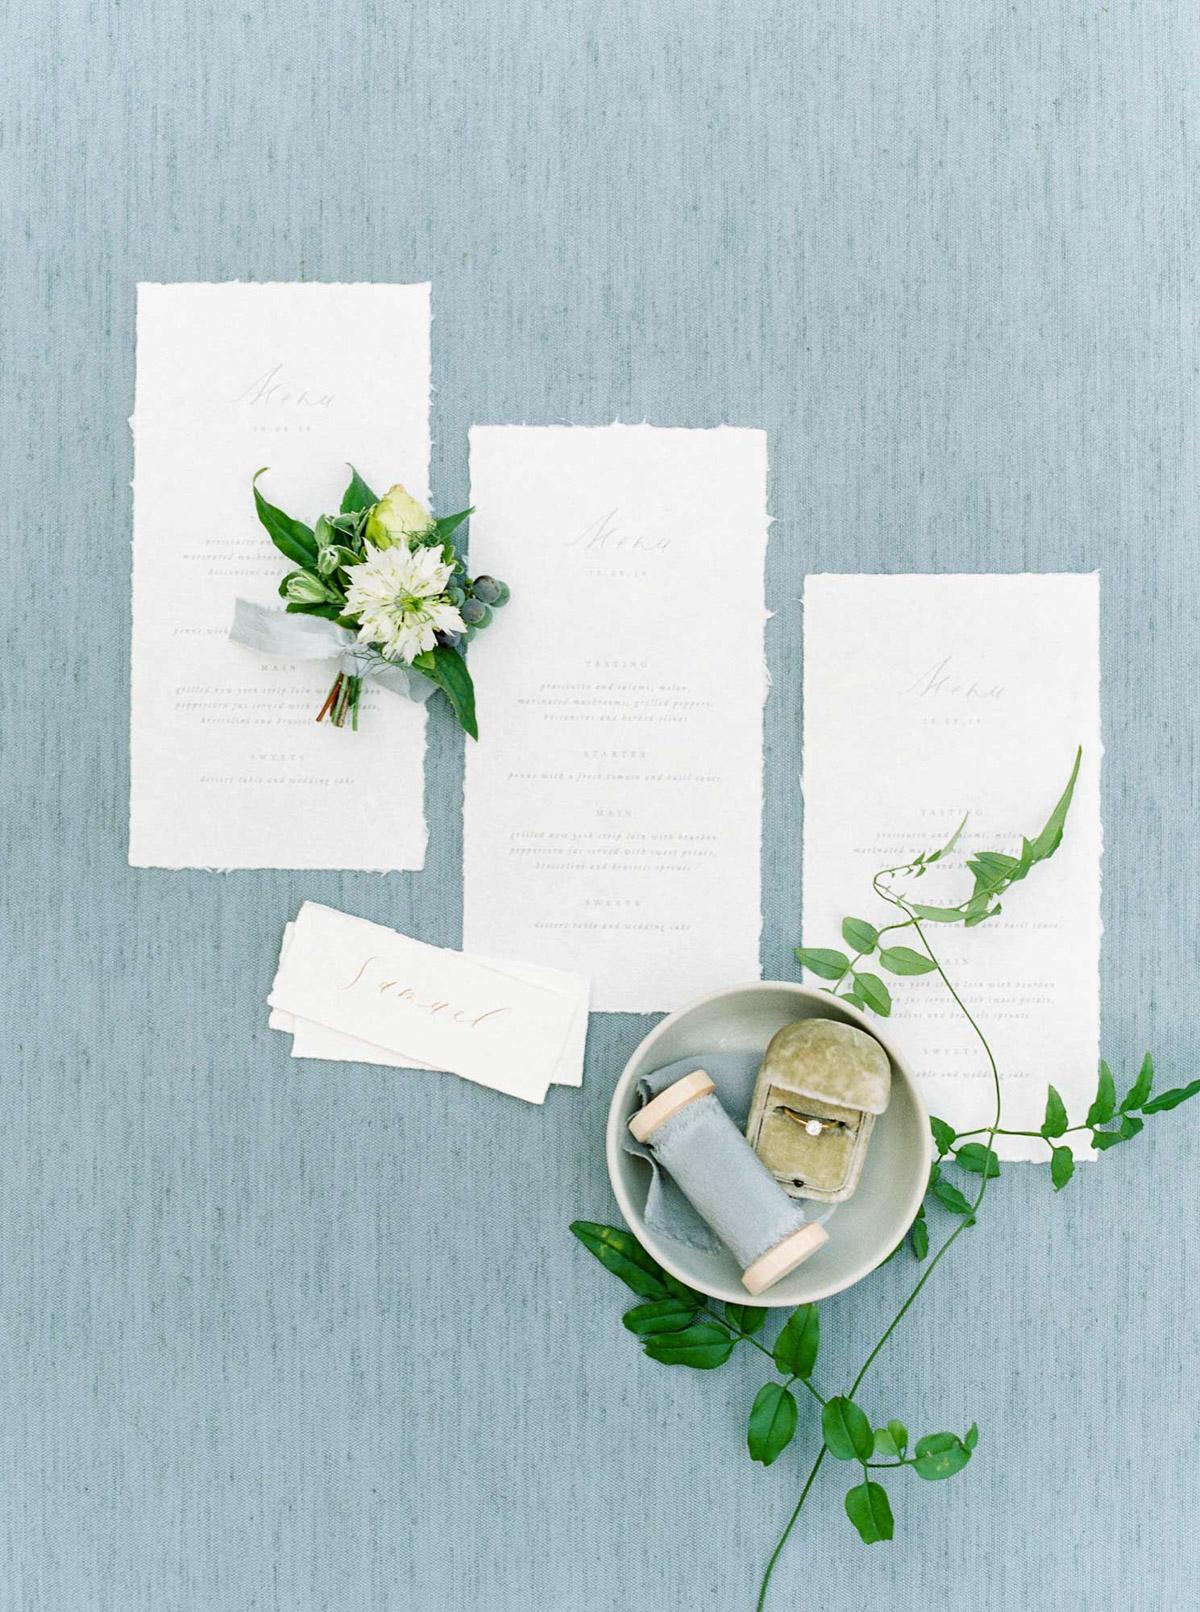 kayla-yestal-vineyard-bride-swish-list-woodland-weddings-niagara-wedding-editorial-10.jpg